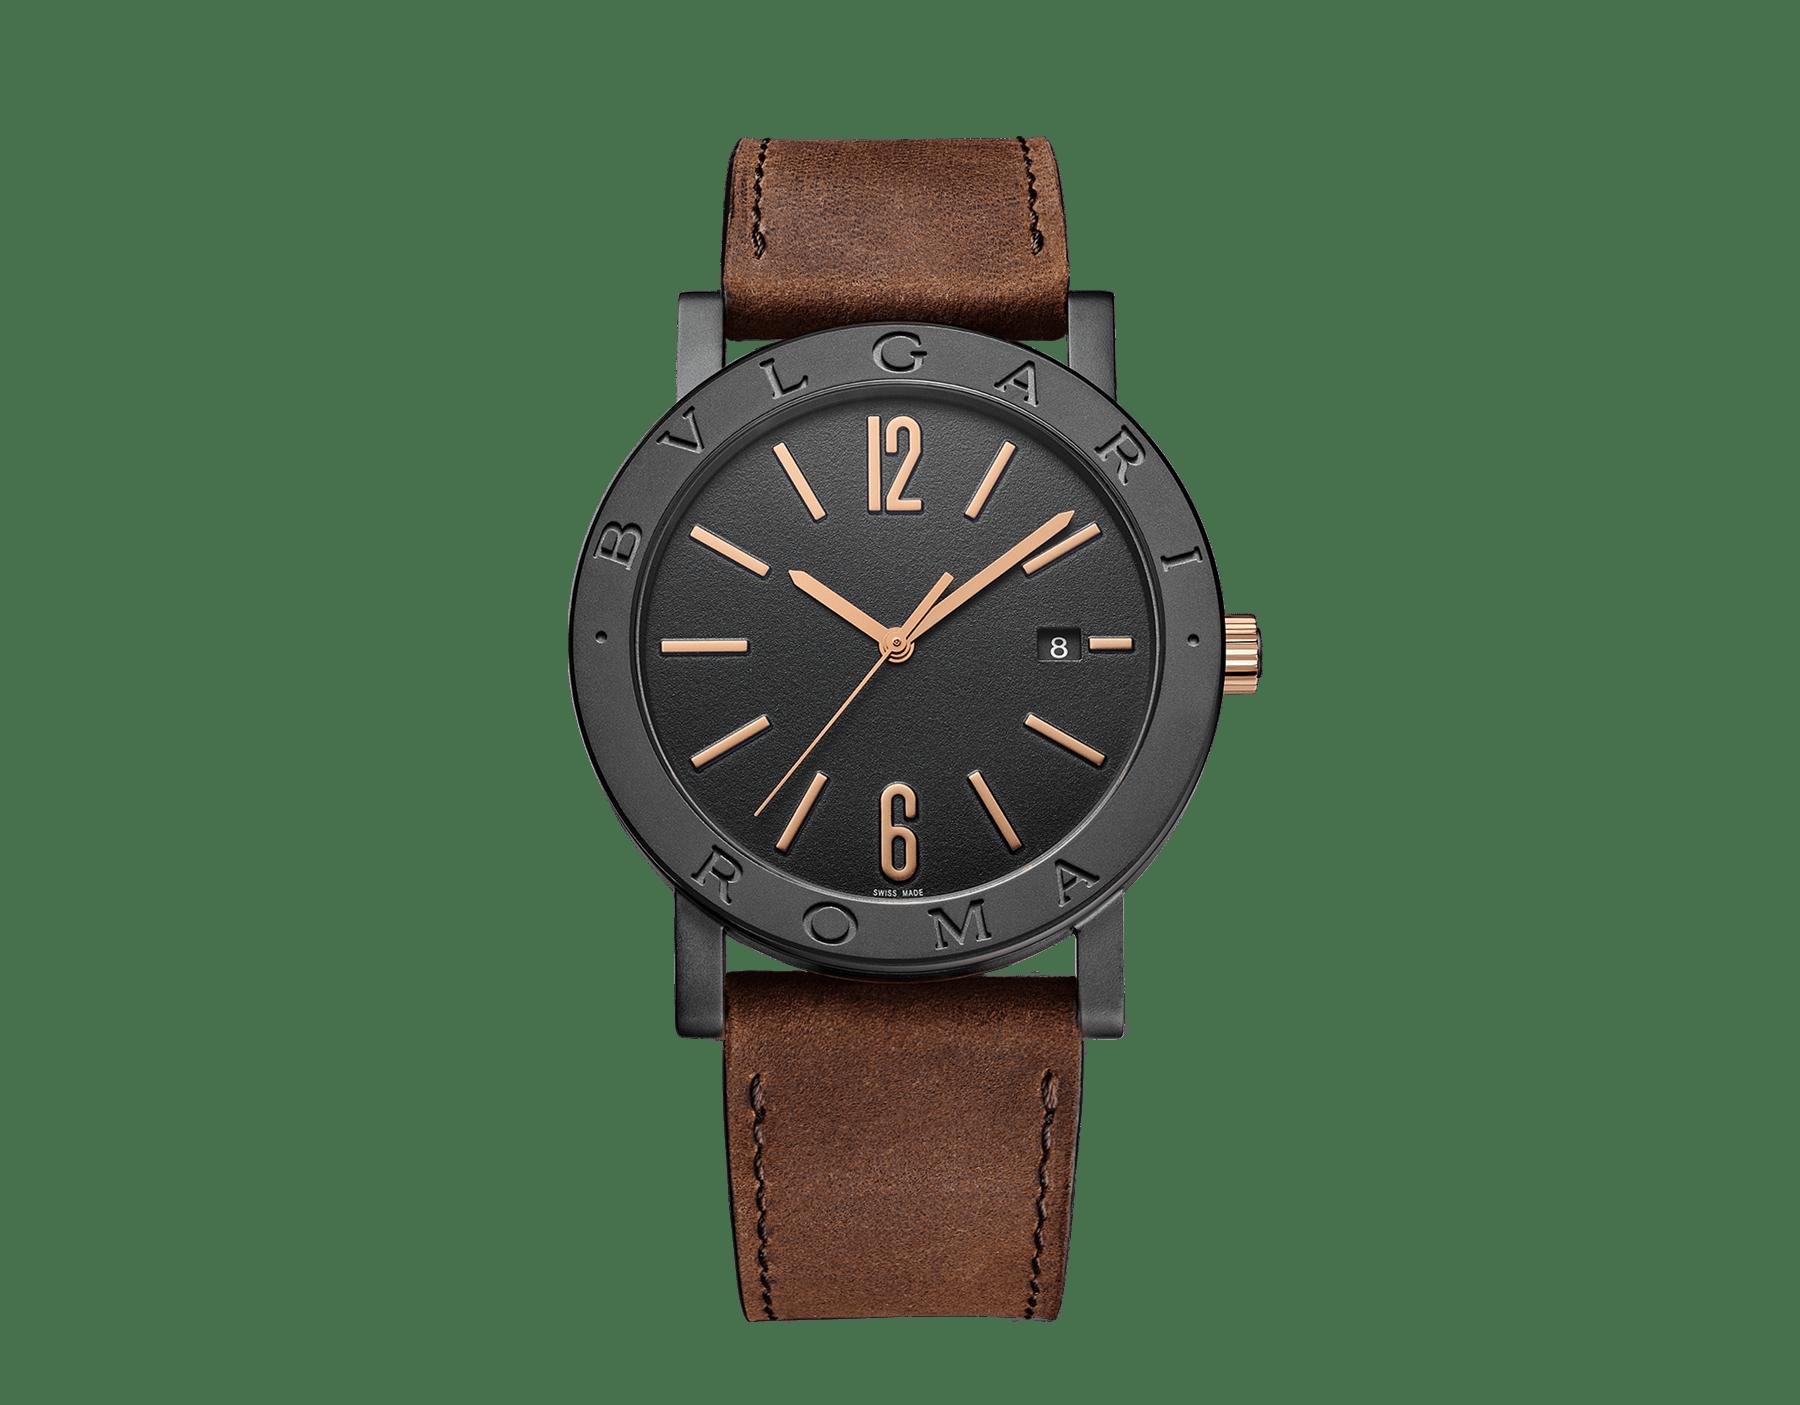 BVLGARI BVLGARI 城市特別版「羅馬」腕錶,搭載機械機芯,自動上鍊。精鋼錶殼,黑色 DLC 類鑽碳高耐磨鍍膜。錶圈鐫刻 BVLGARI ROMA 字樣,透明底蓋。黑色漆面錶盤,玫瑰金時標。棕色小牛皮錶帶,可換式黑色橡膠錶帶。 103219 image 1